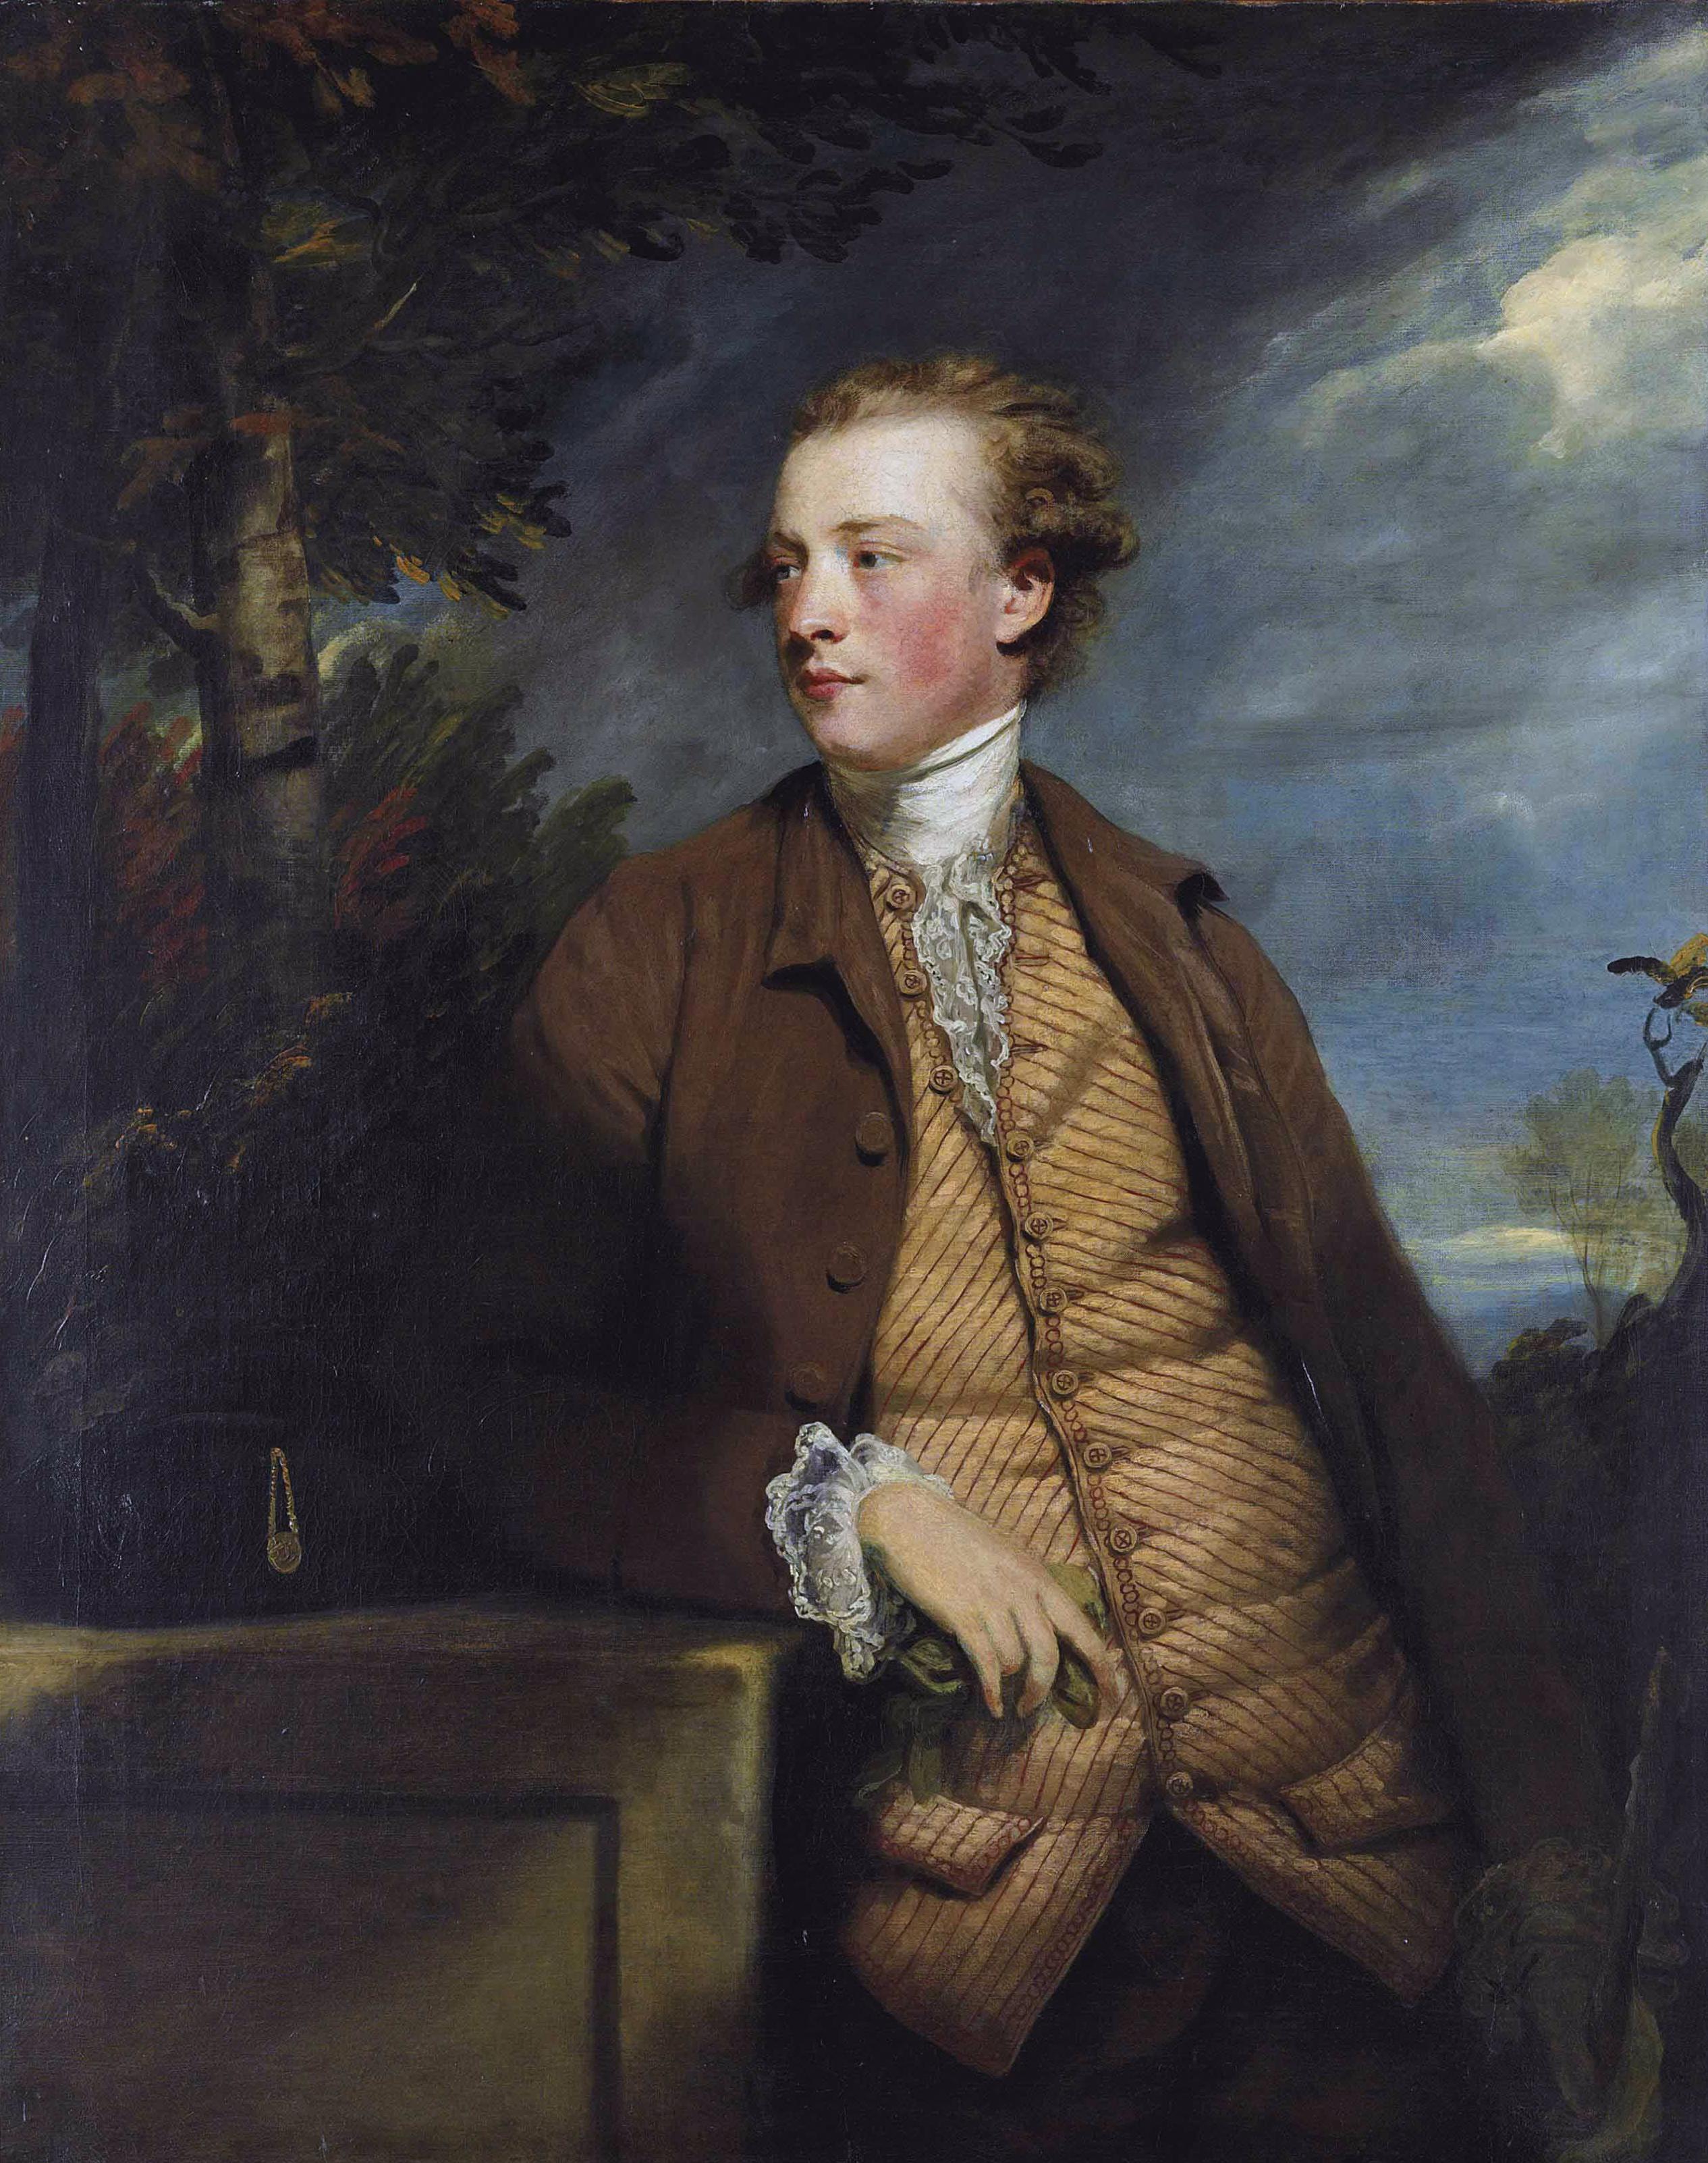 Denis Daly (died 1791) Quiz